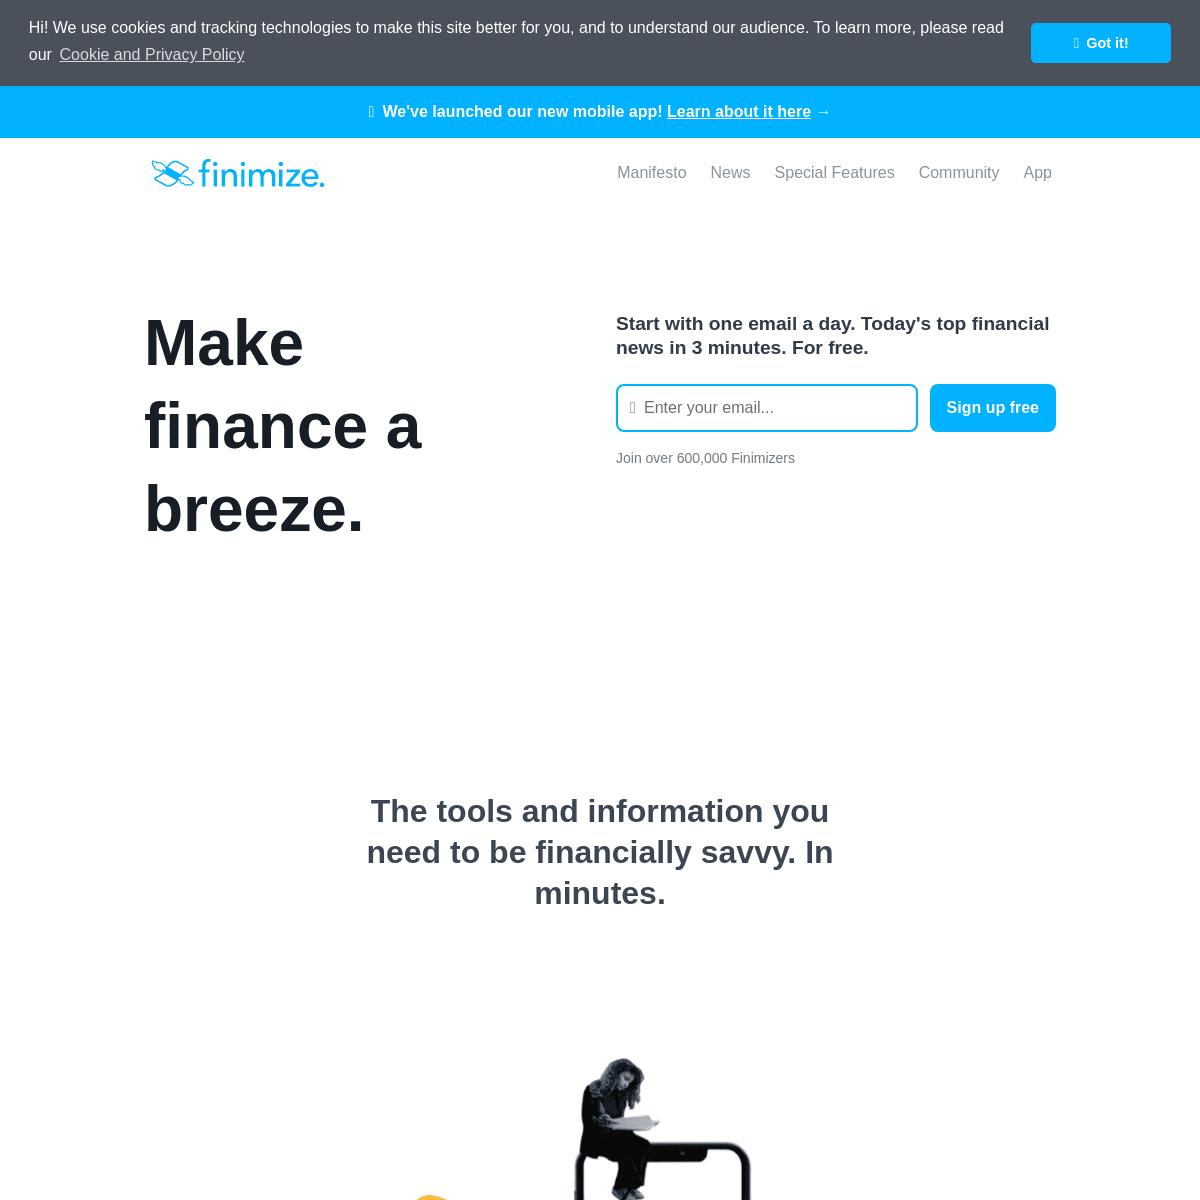 Finimize- make finance a breeze - Make smarter finance decisions. Subscribe now. - Finimize